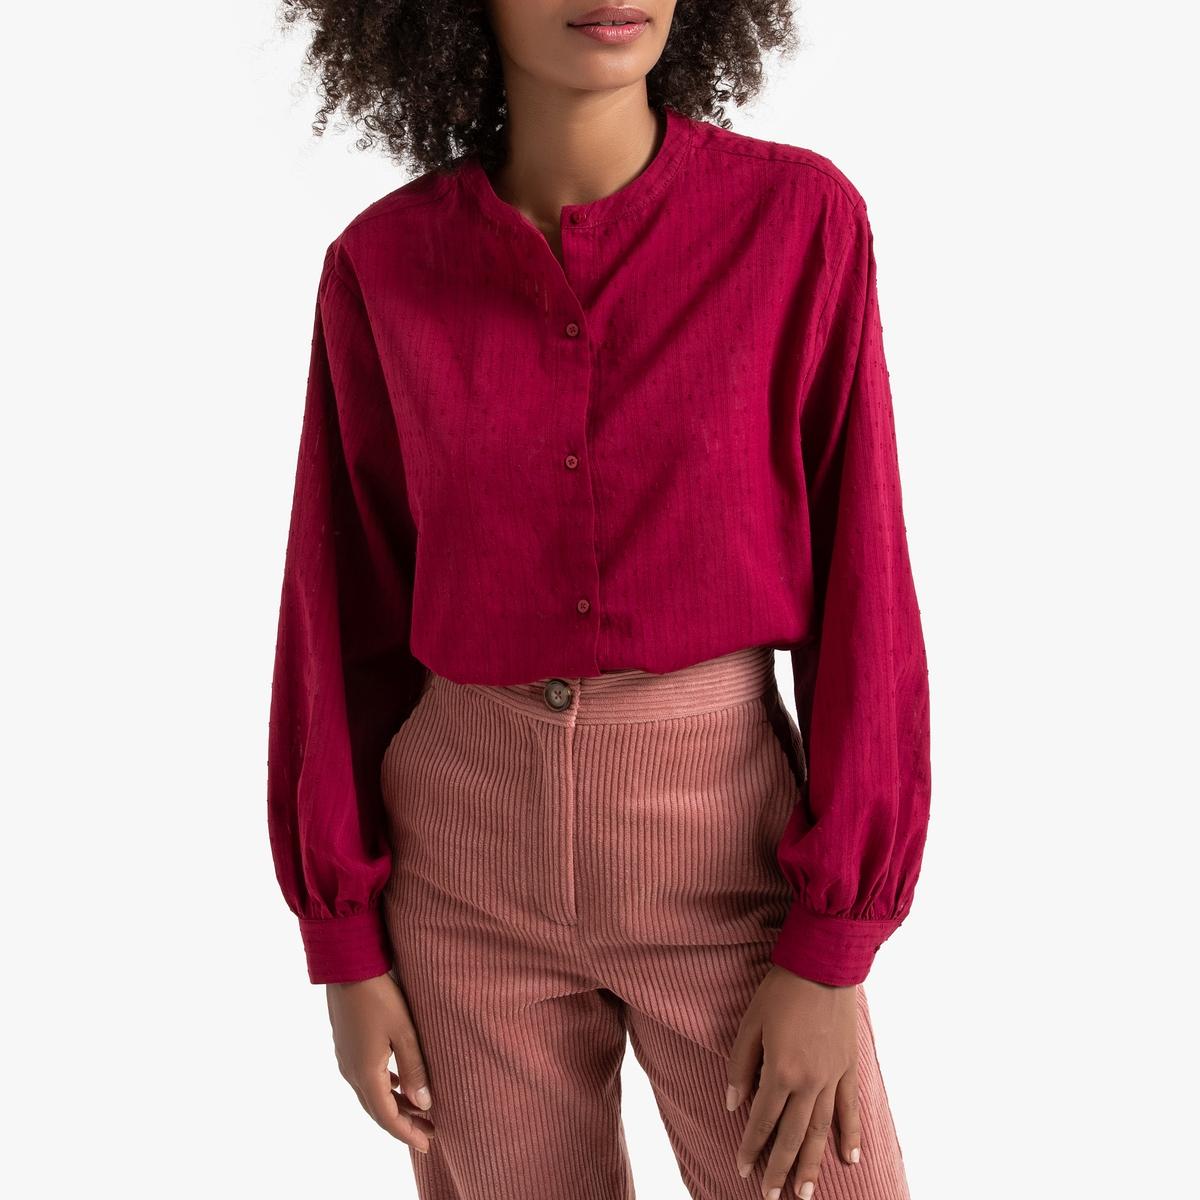 Blusa amplia con cuello redondo, de manga larga